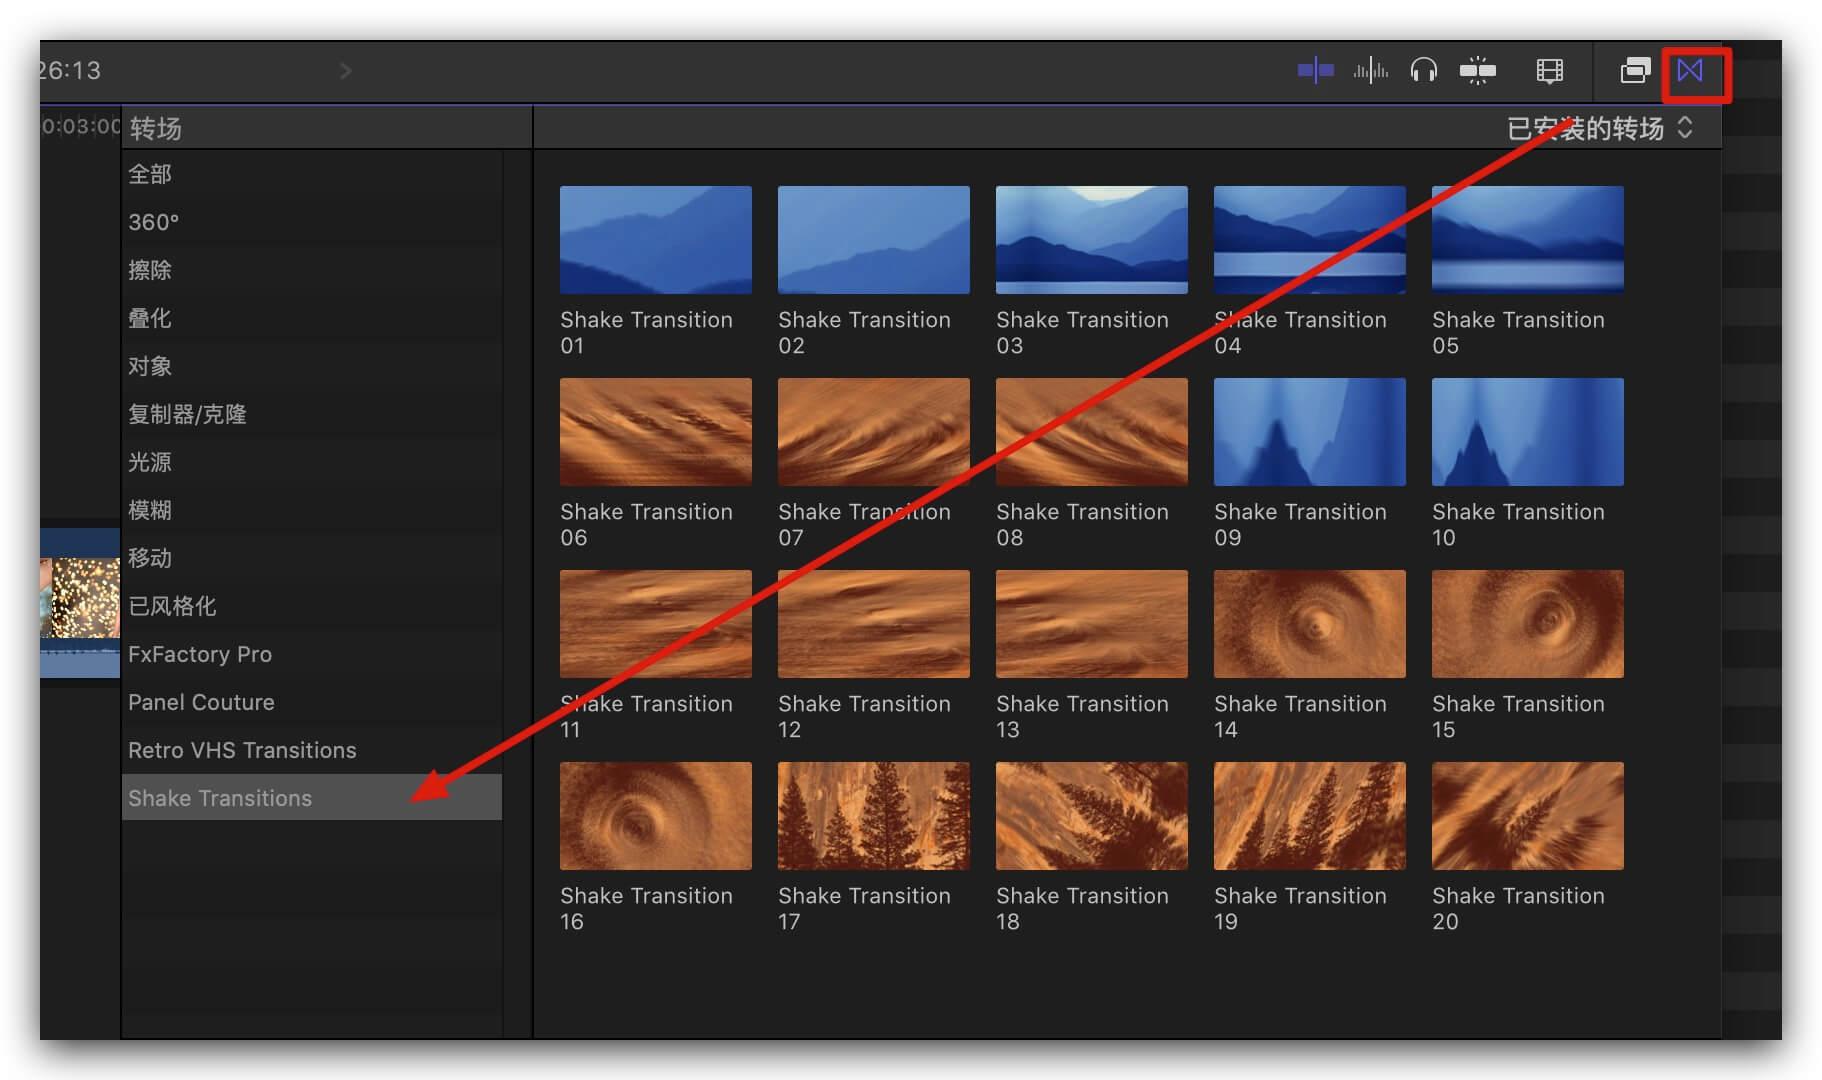 fcpx转场插件 20组镜头摇晃过渡转场 Vlog旅拍写真等常用转场效果